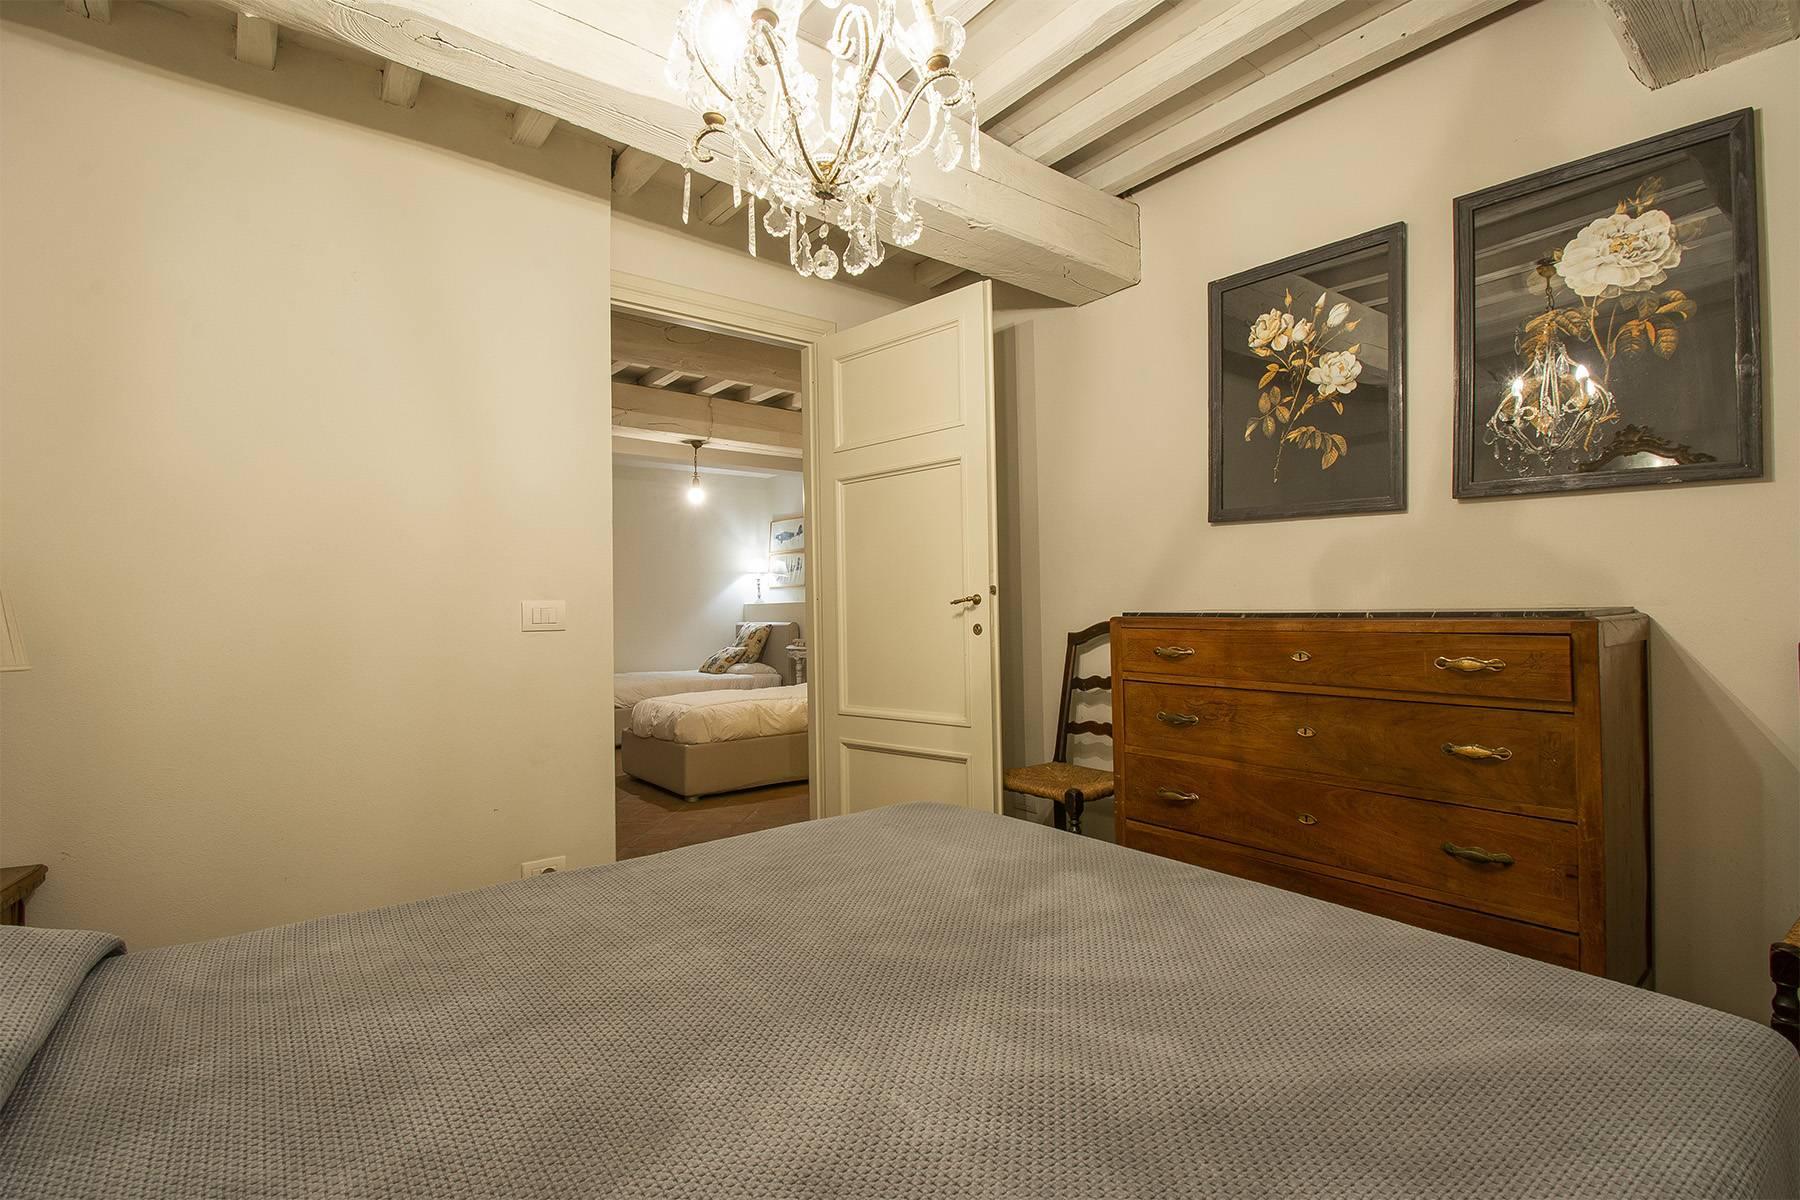 Appartement exclusif au coeur de Lucca - 26